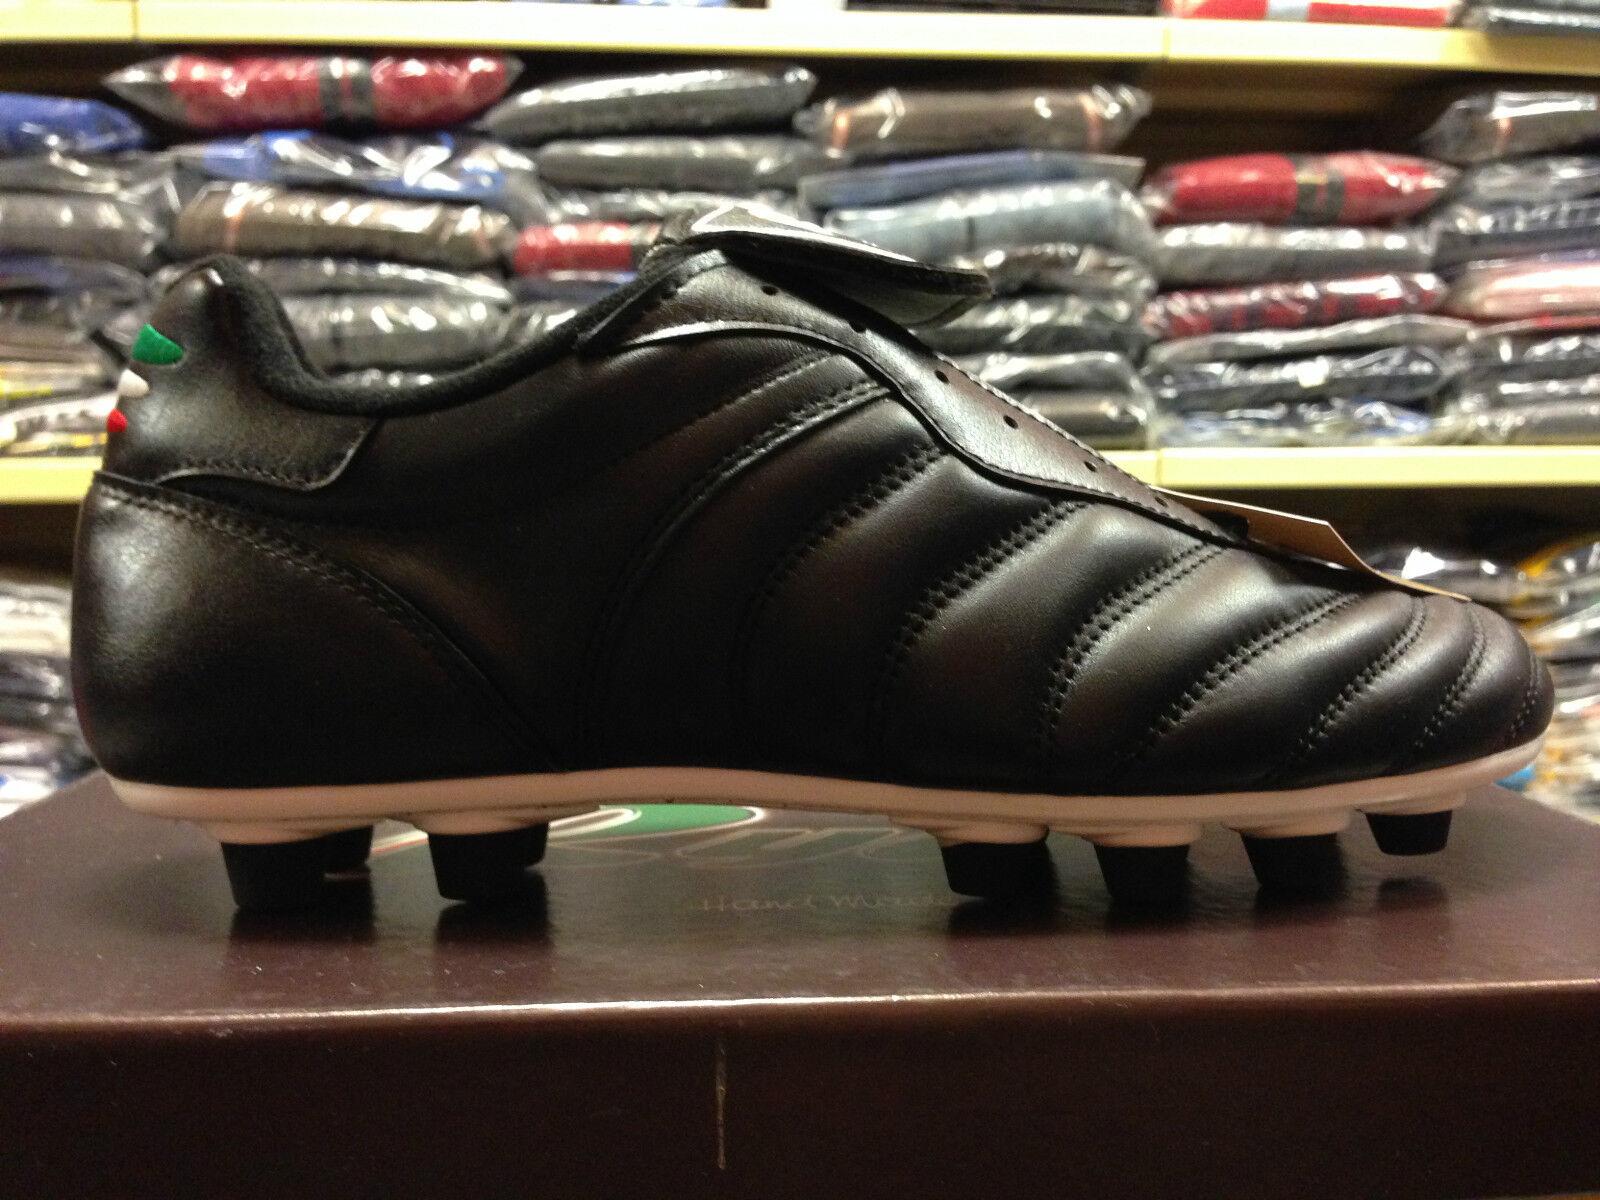 chaussure Fußball festen Bolzen RYAL Mod. Italie aus Känguru